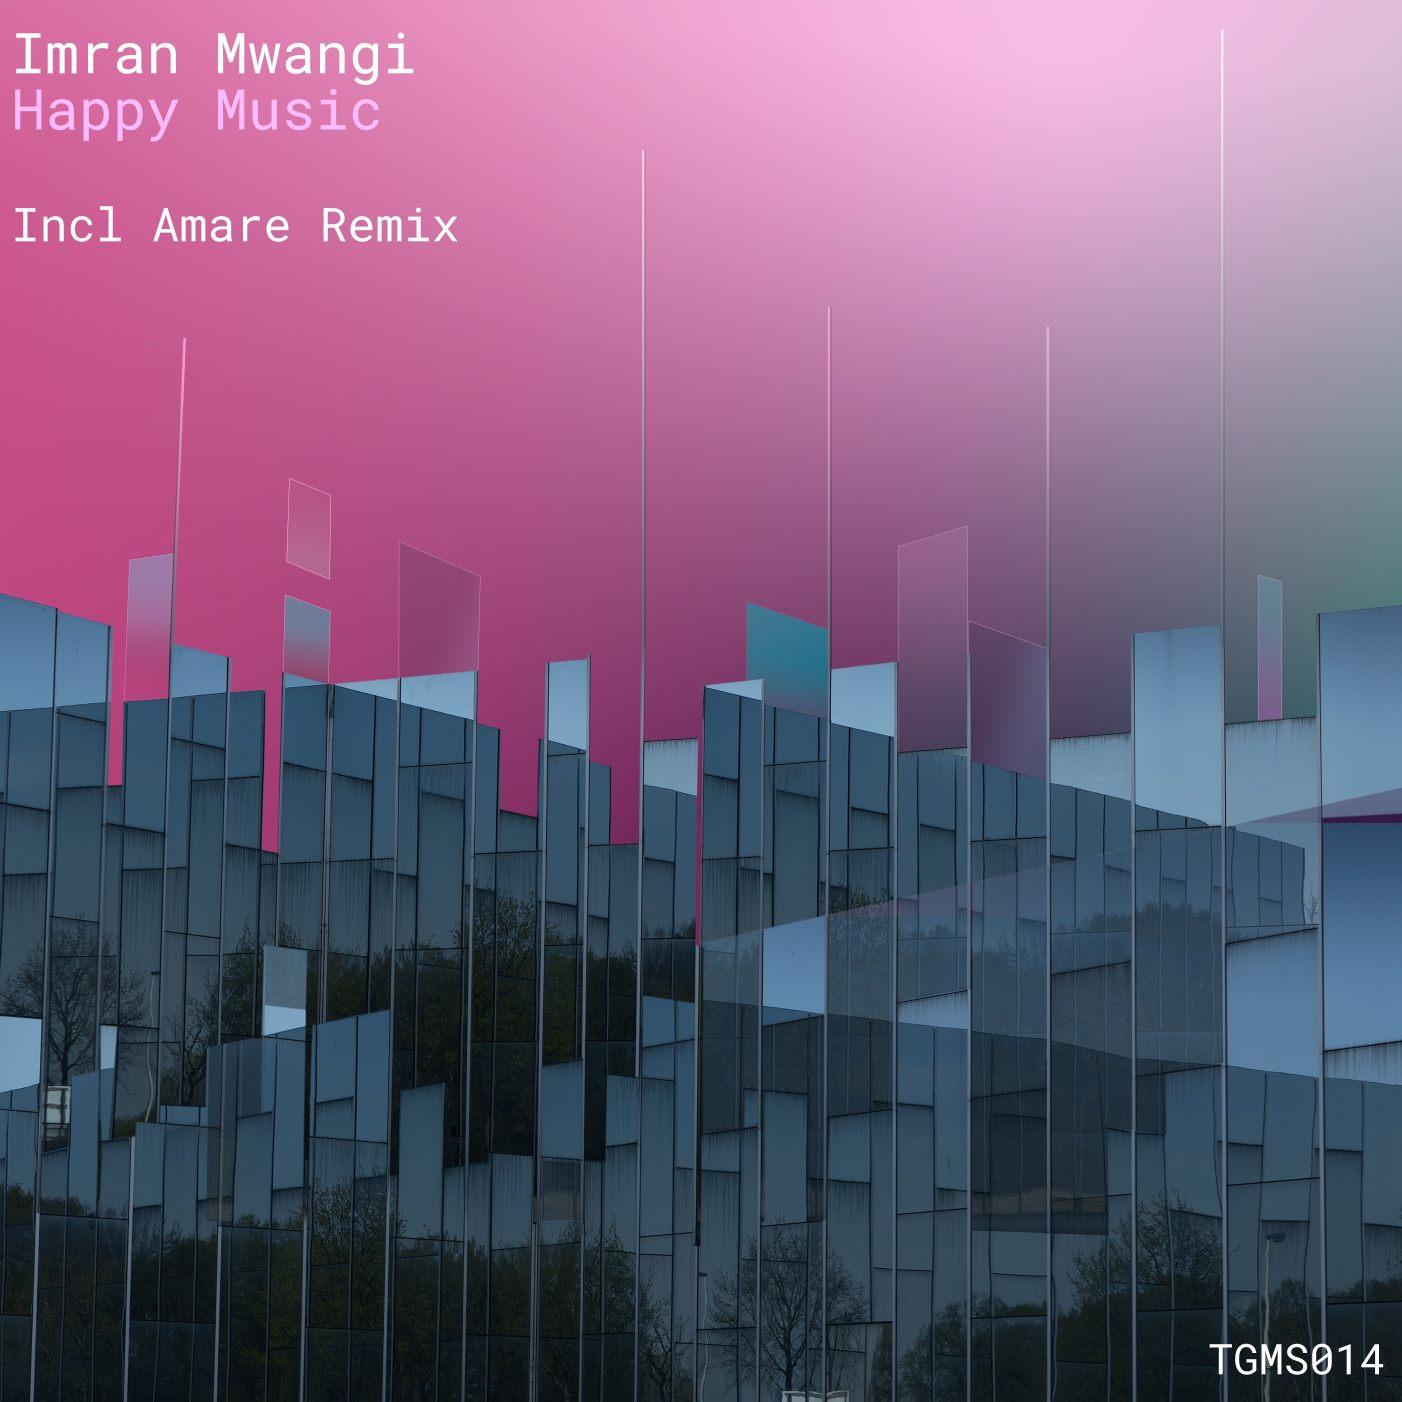 Imran Mwangi - Happy Music (incl. Amare Remix)